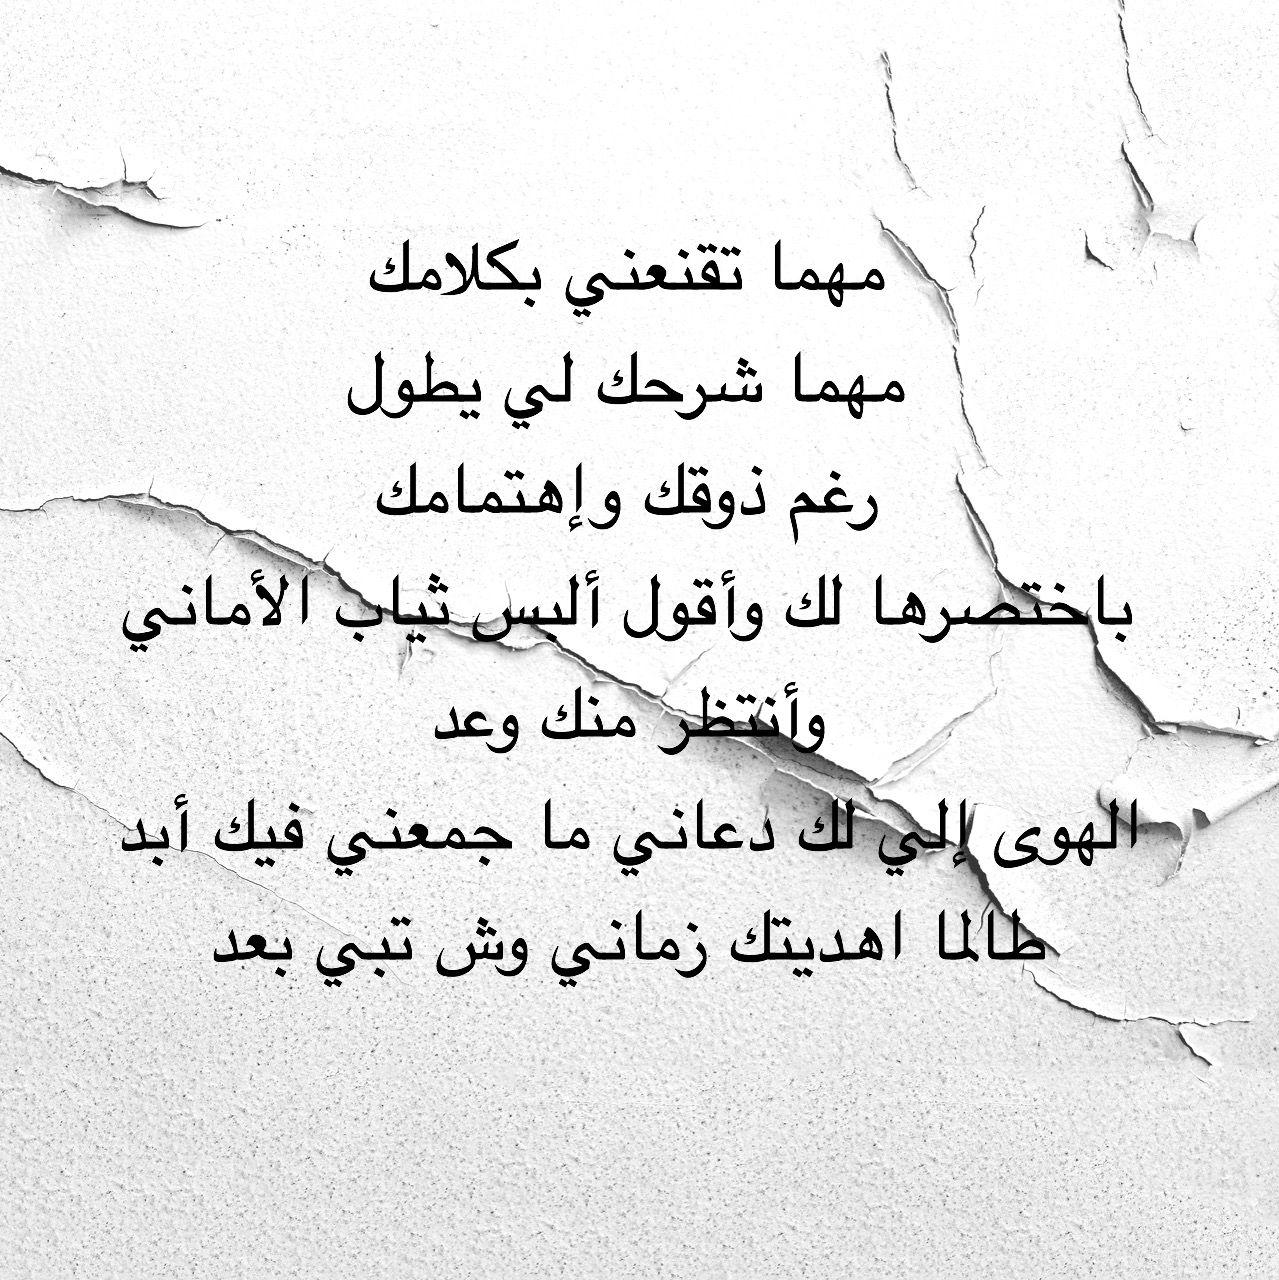 عبادي الجوهر Arabic Calligraphy Calligraphy